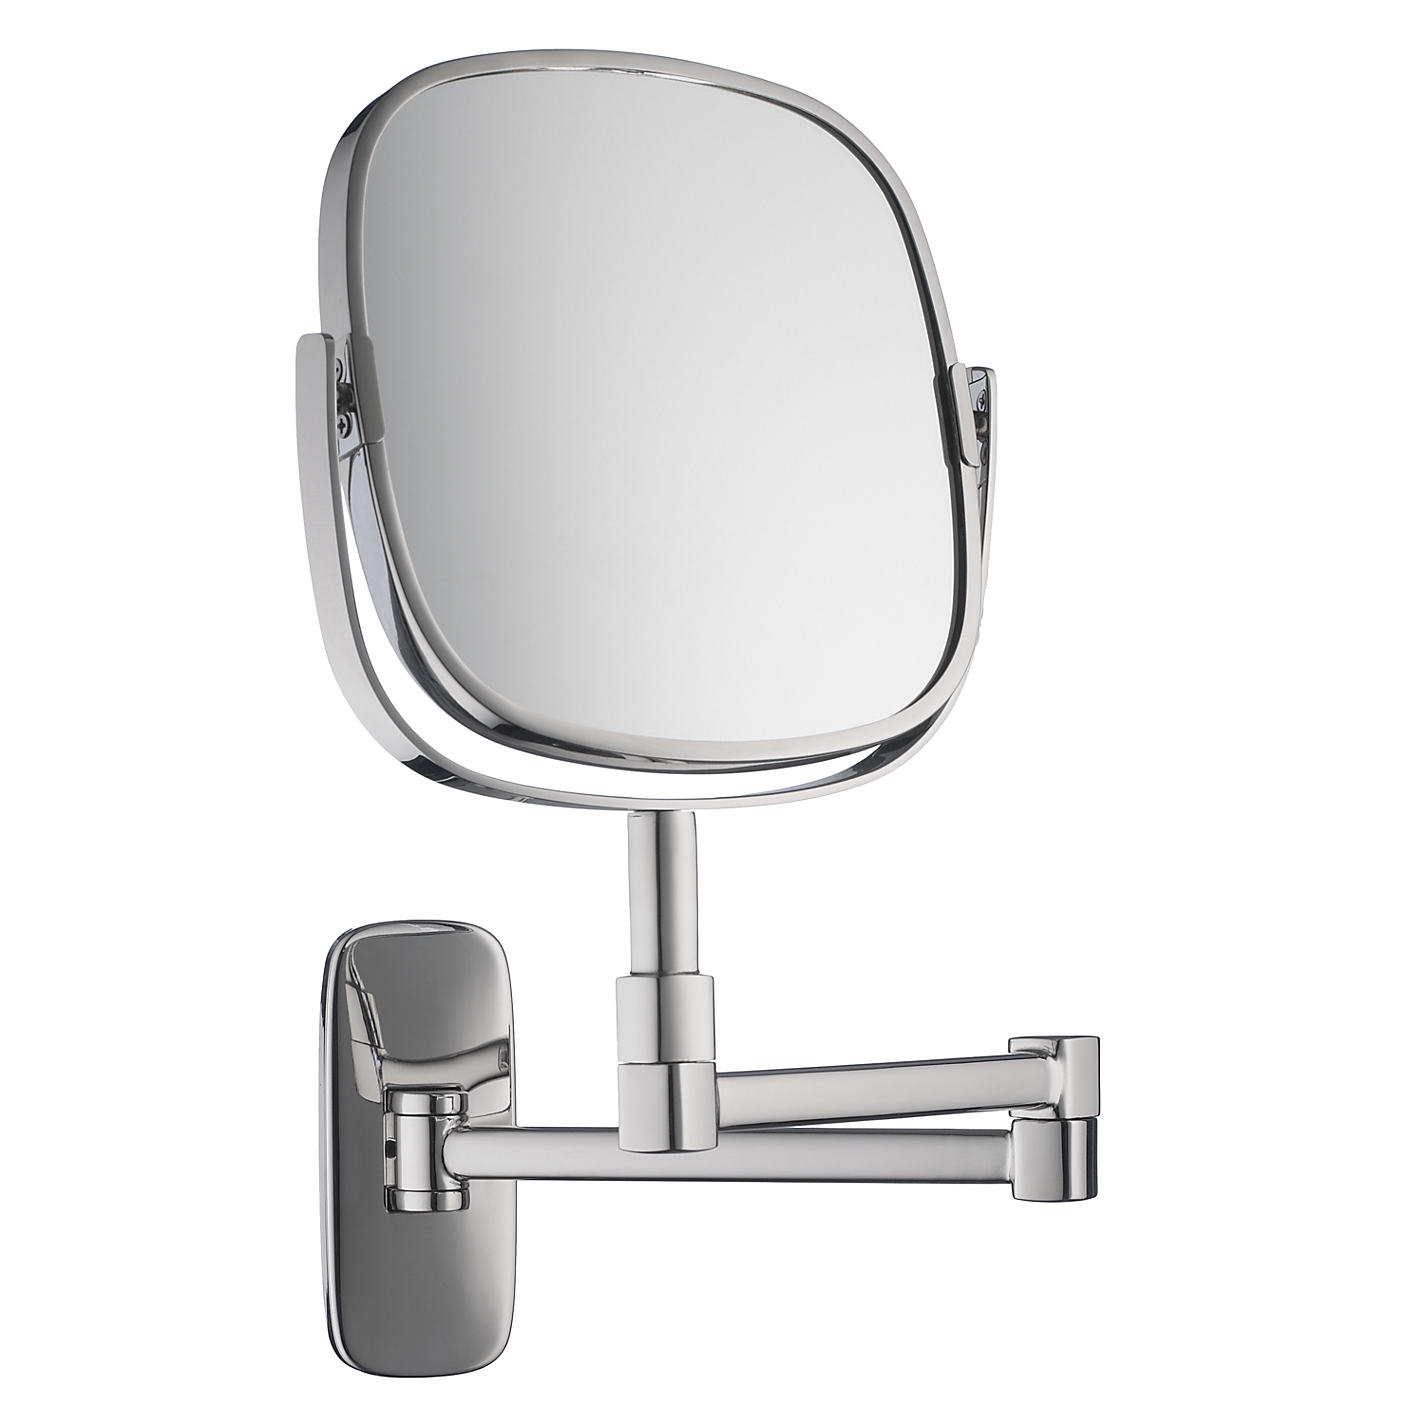 Extendable Bathroom Wall Mirrors